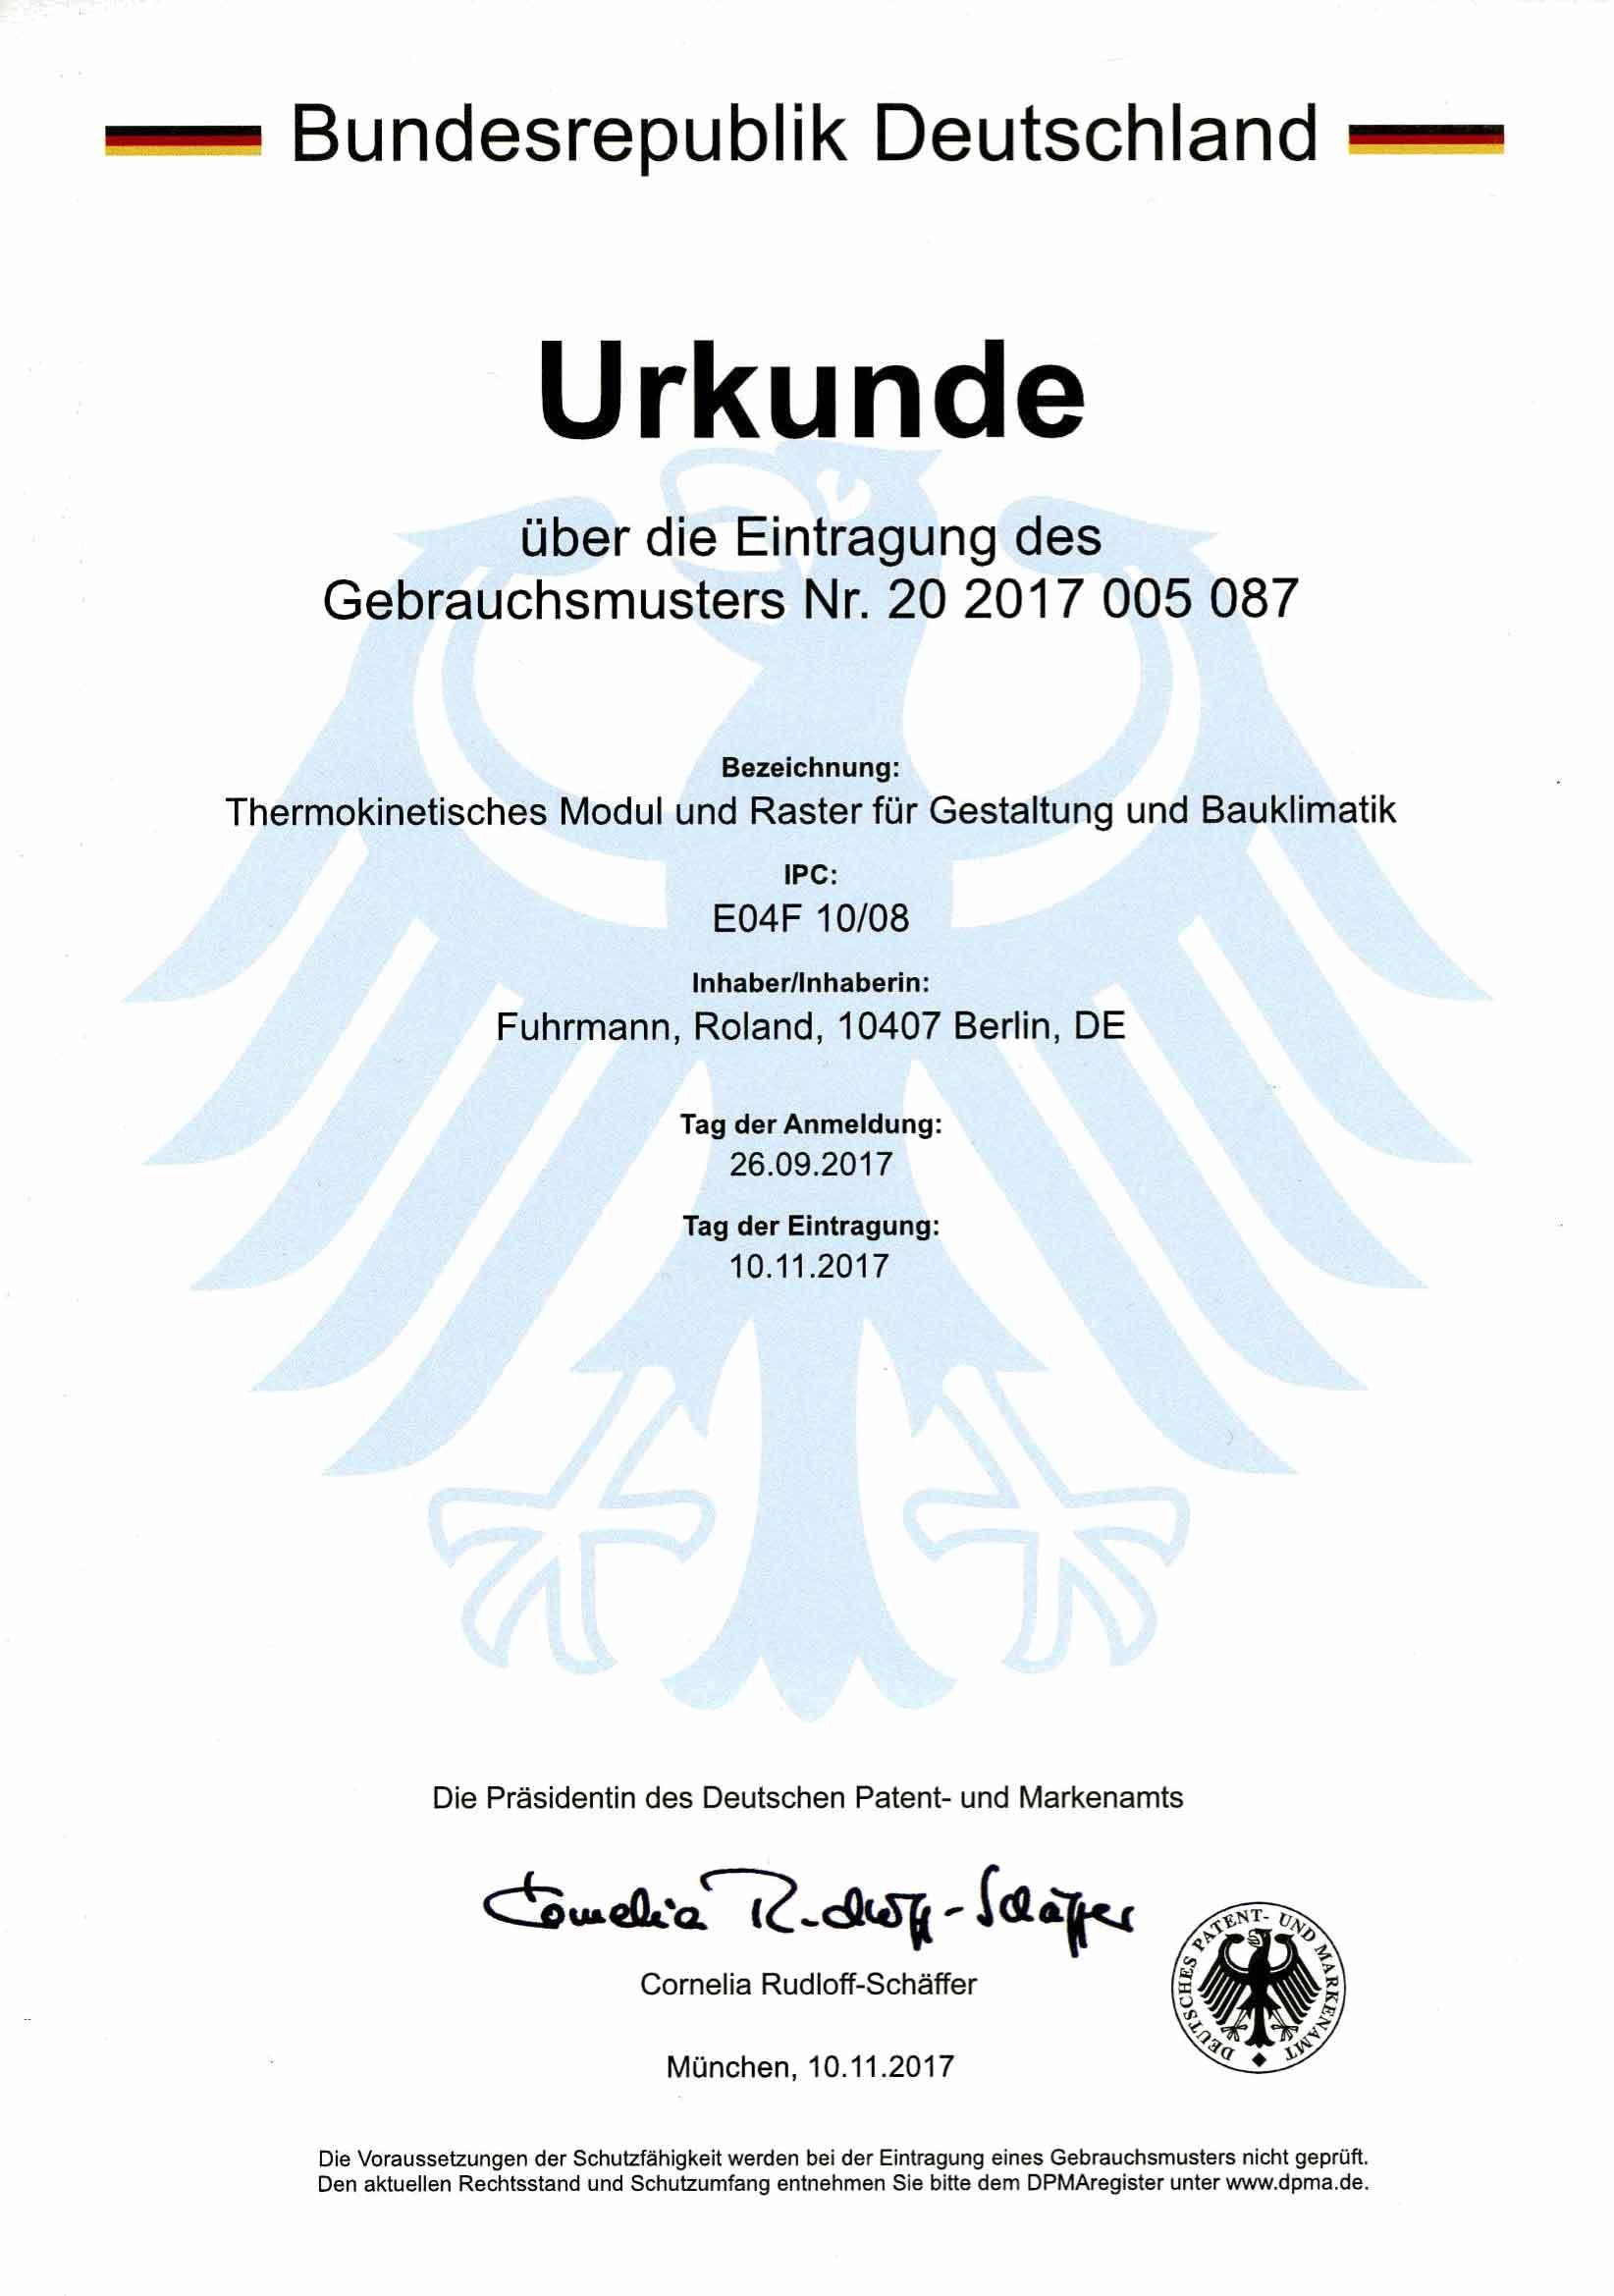 Großartig Sternschaltplan Ideen - Der Schaltplan - greigo.com